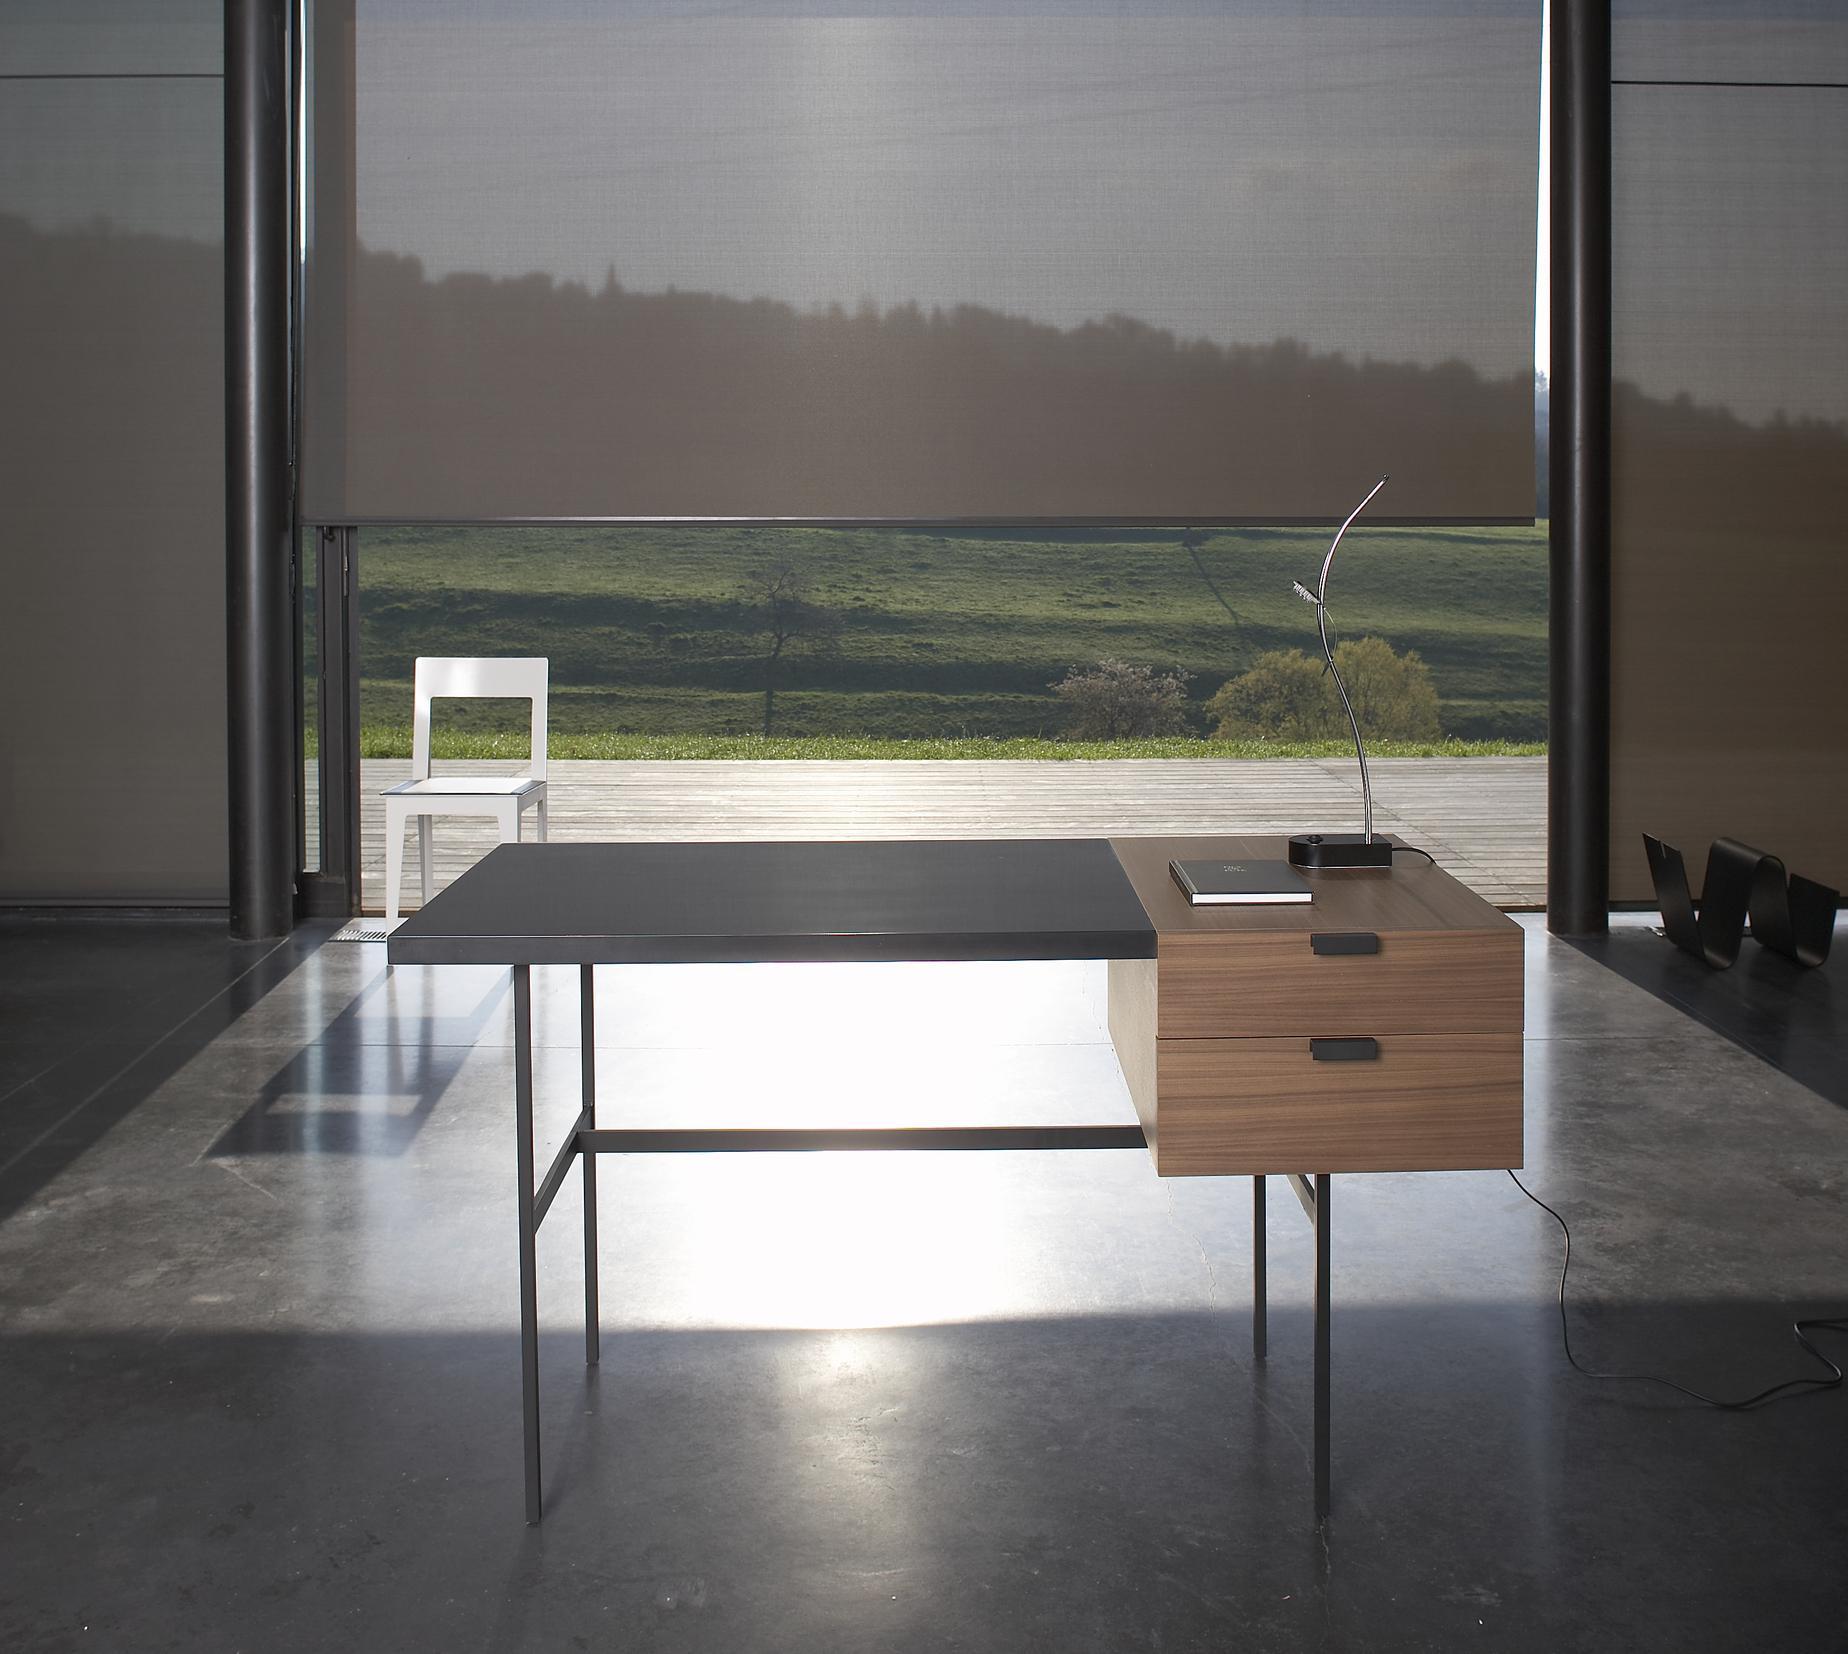 tanis desks secretary from designer pierre paulin ligne roset official site. Black Bedroom Furniture Sets. Home Design Ideas